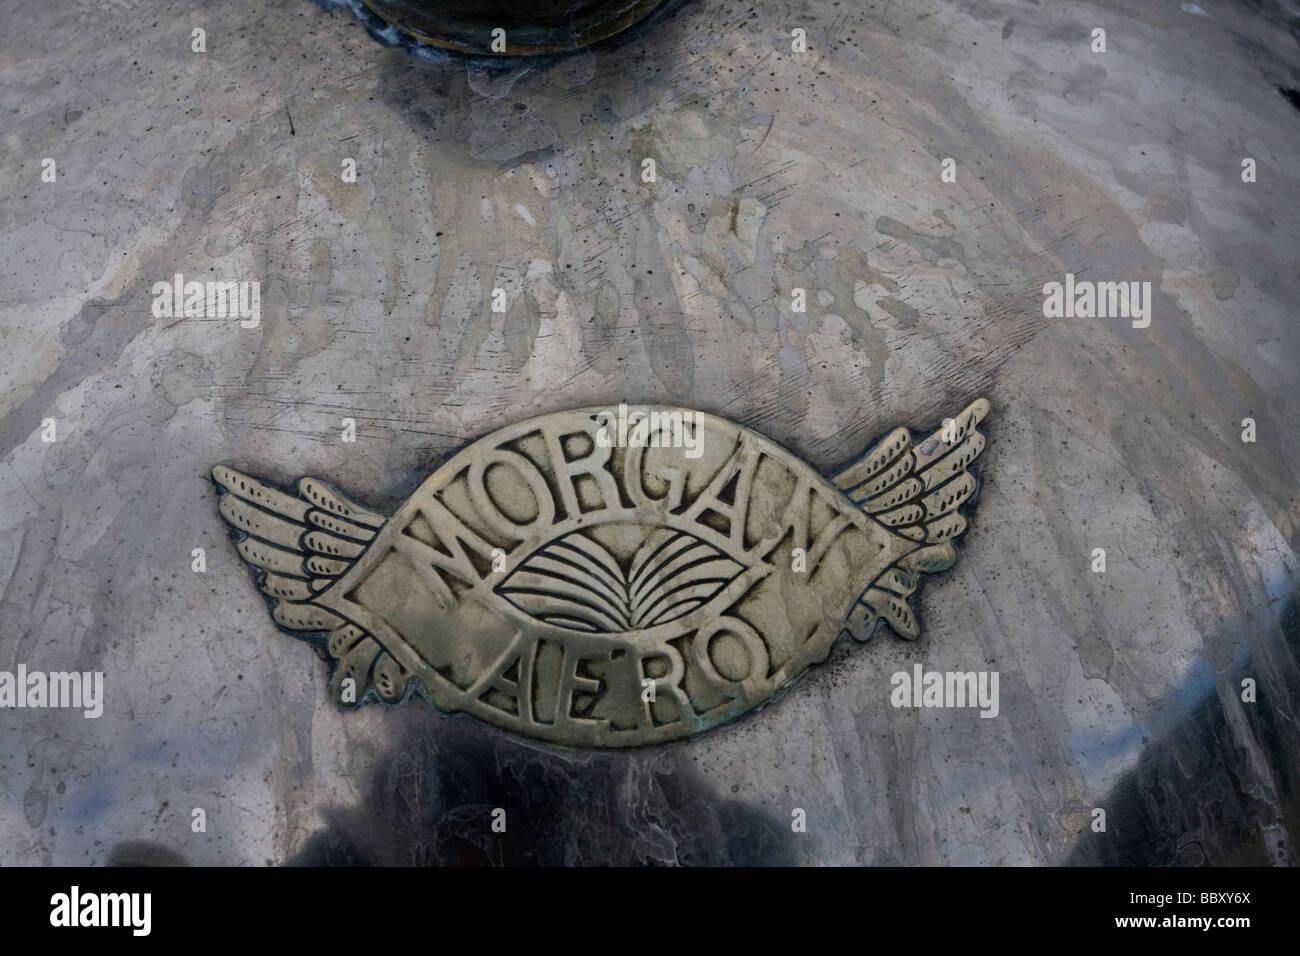 Morgan Aero Motor Car Detail Badge on Bonnet - Stock Image